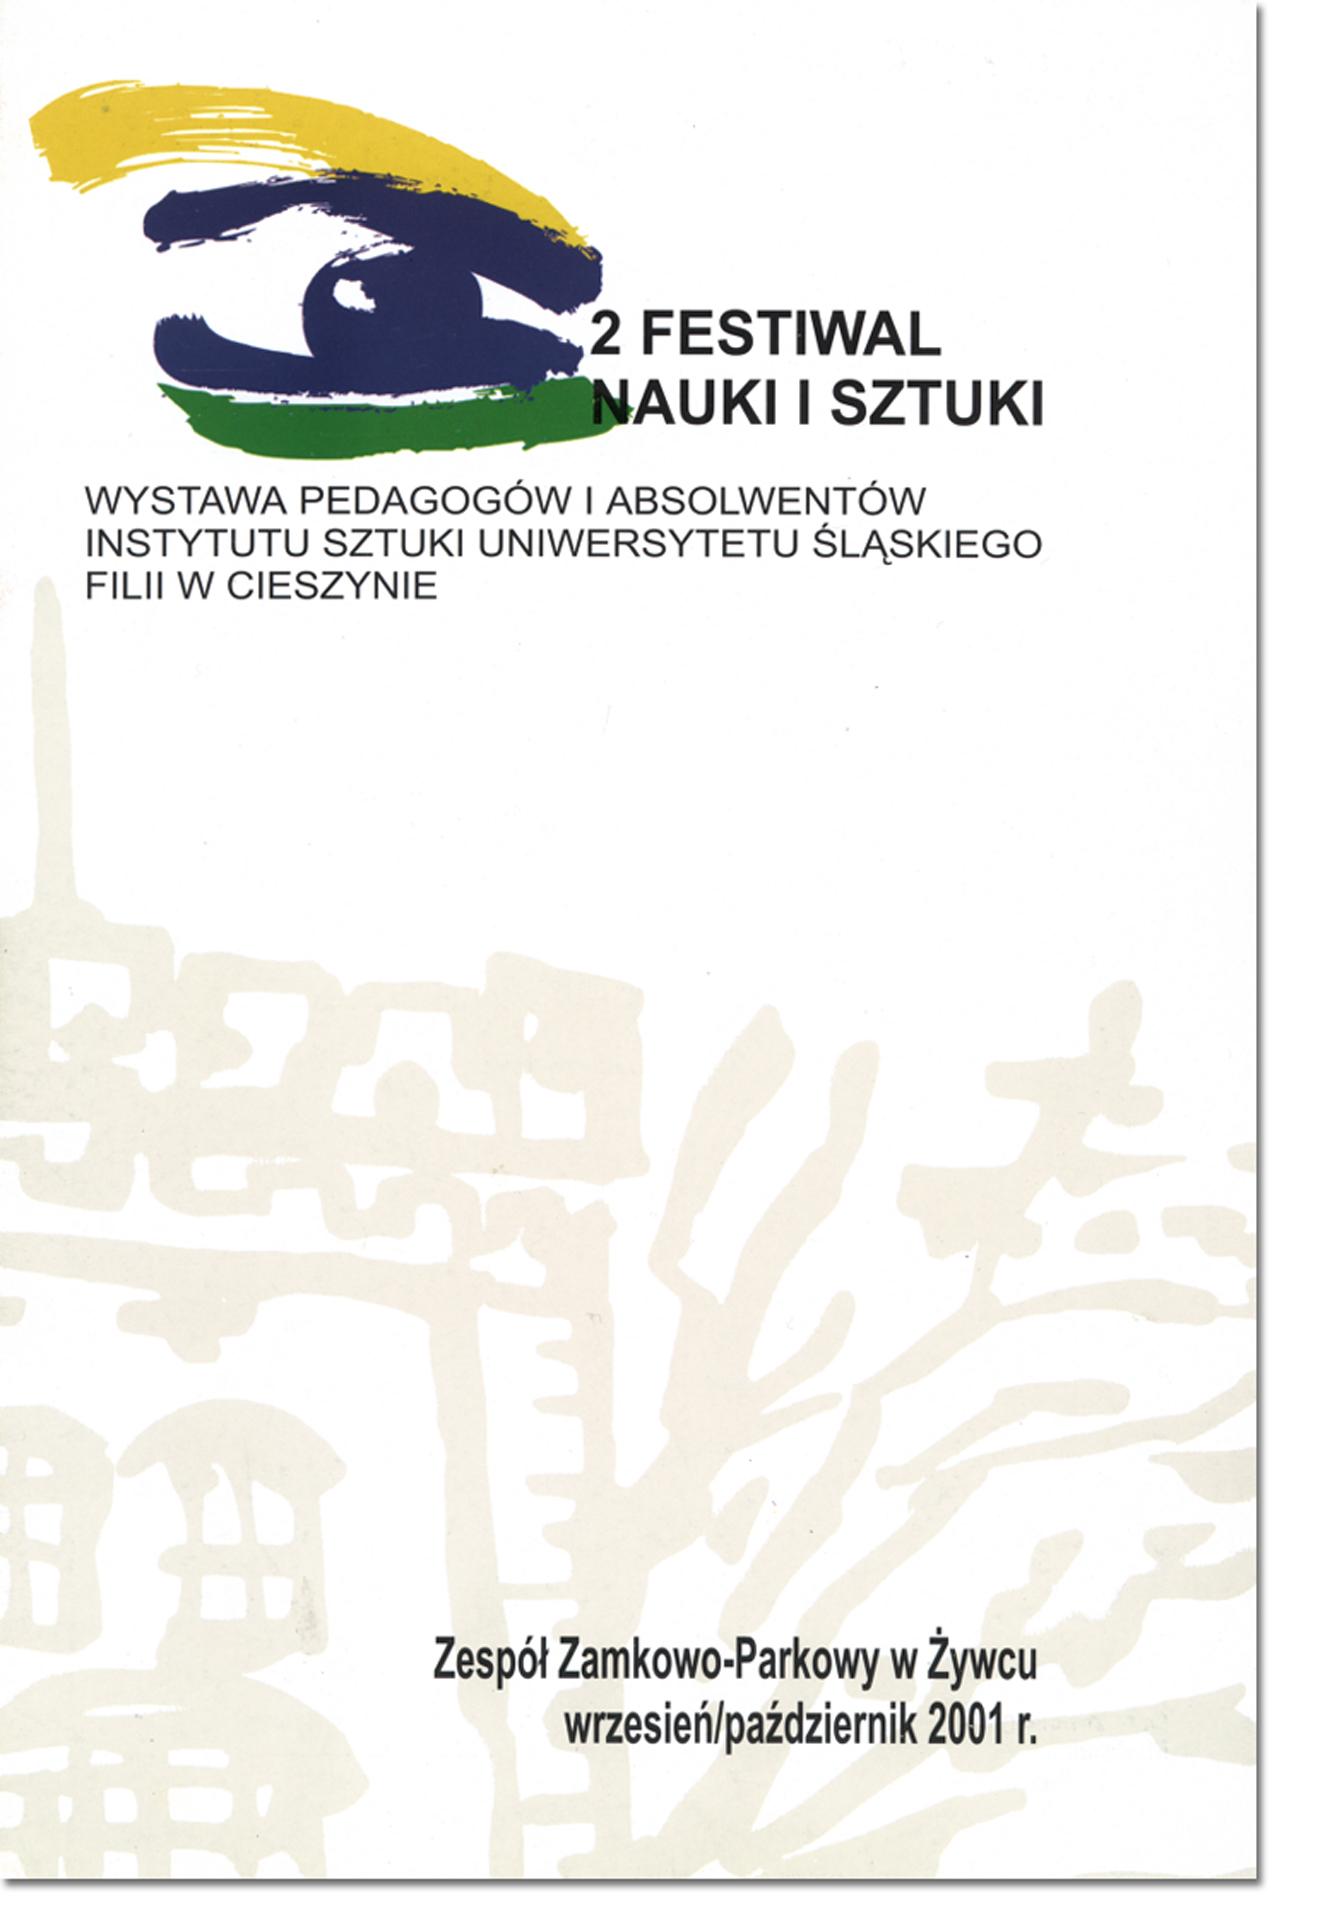 Festiwal01.jpg